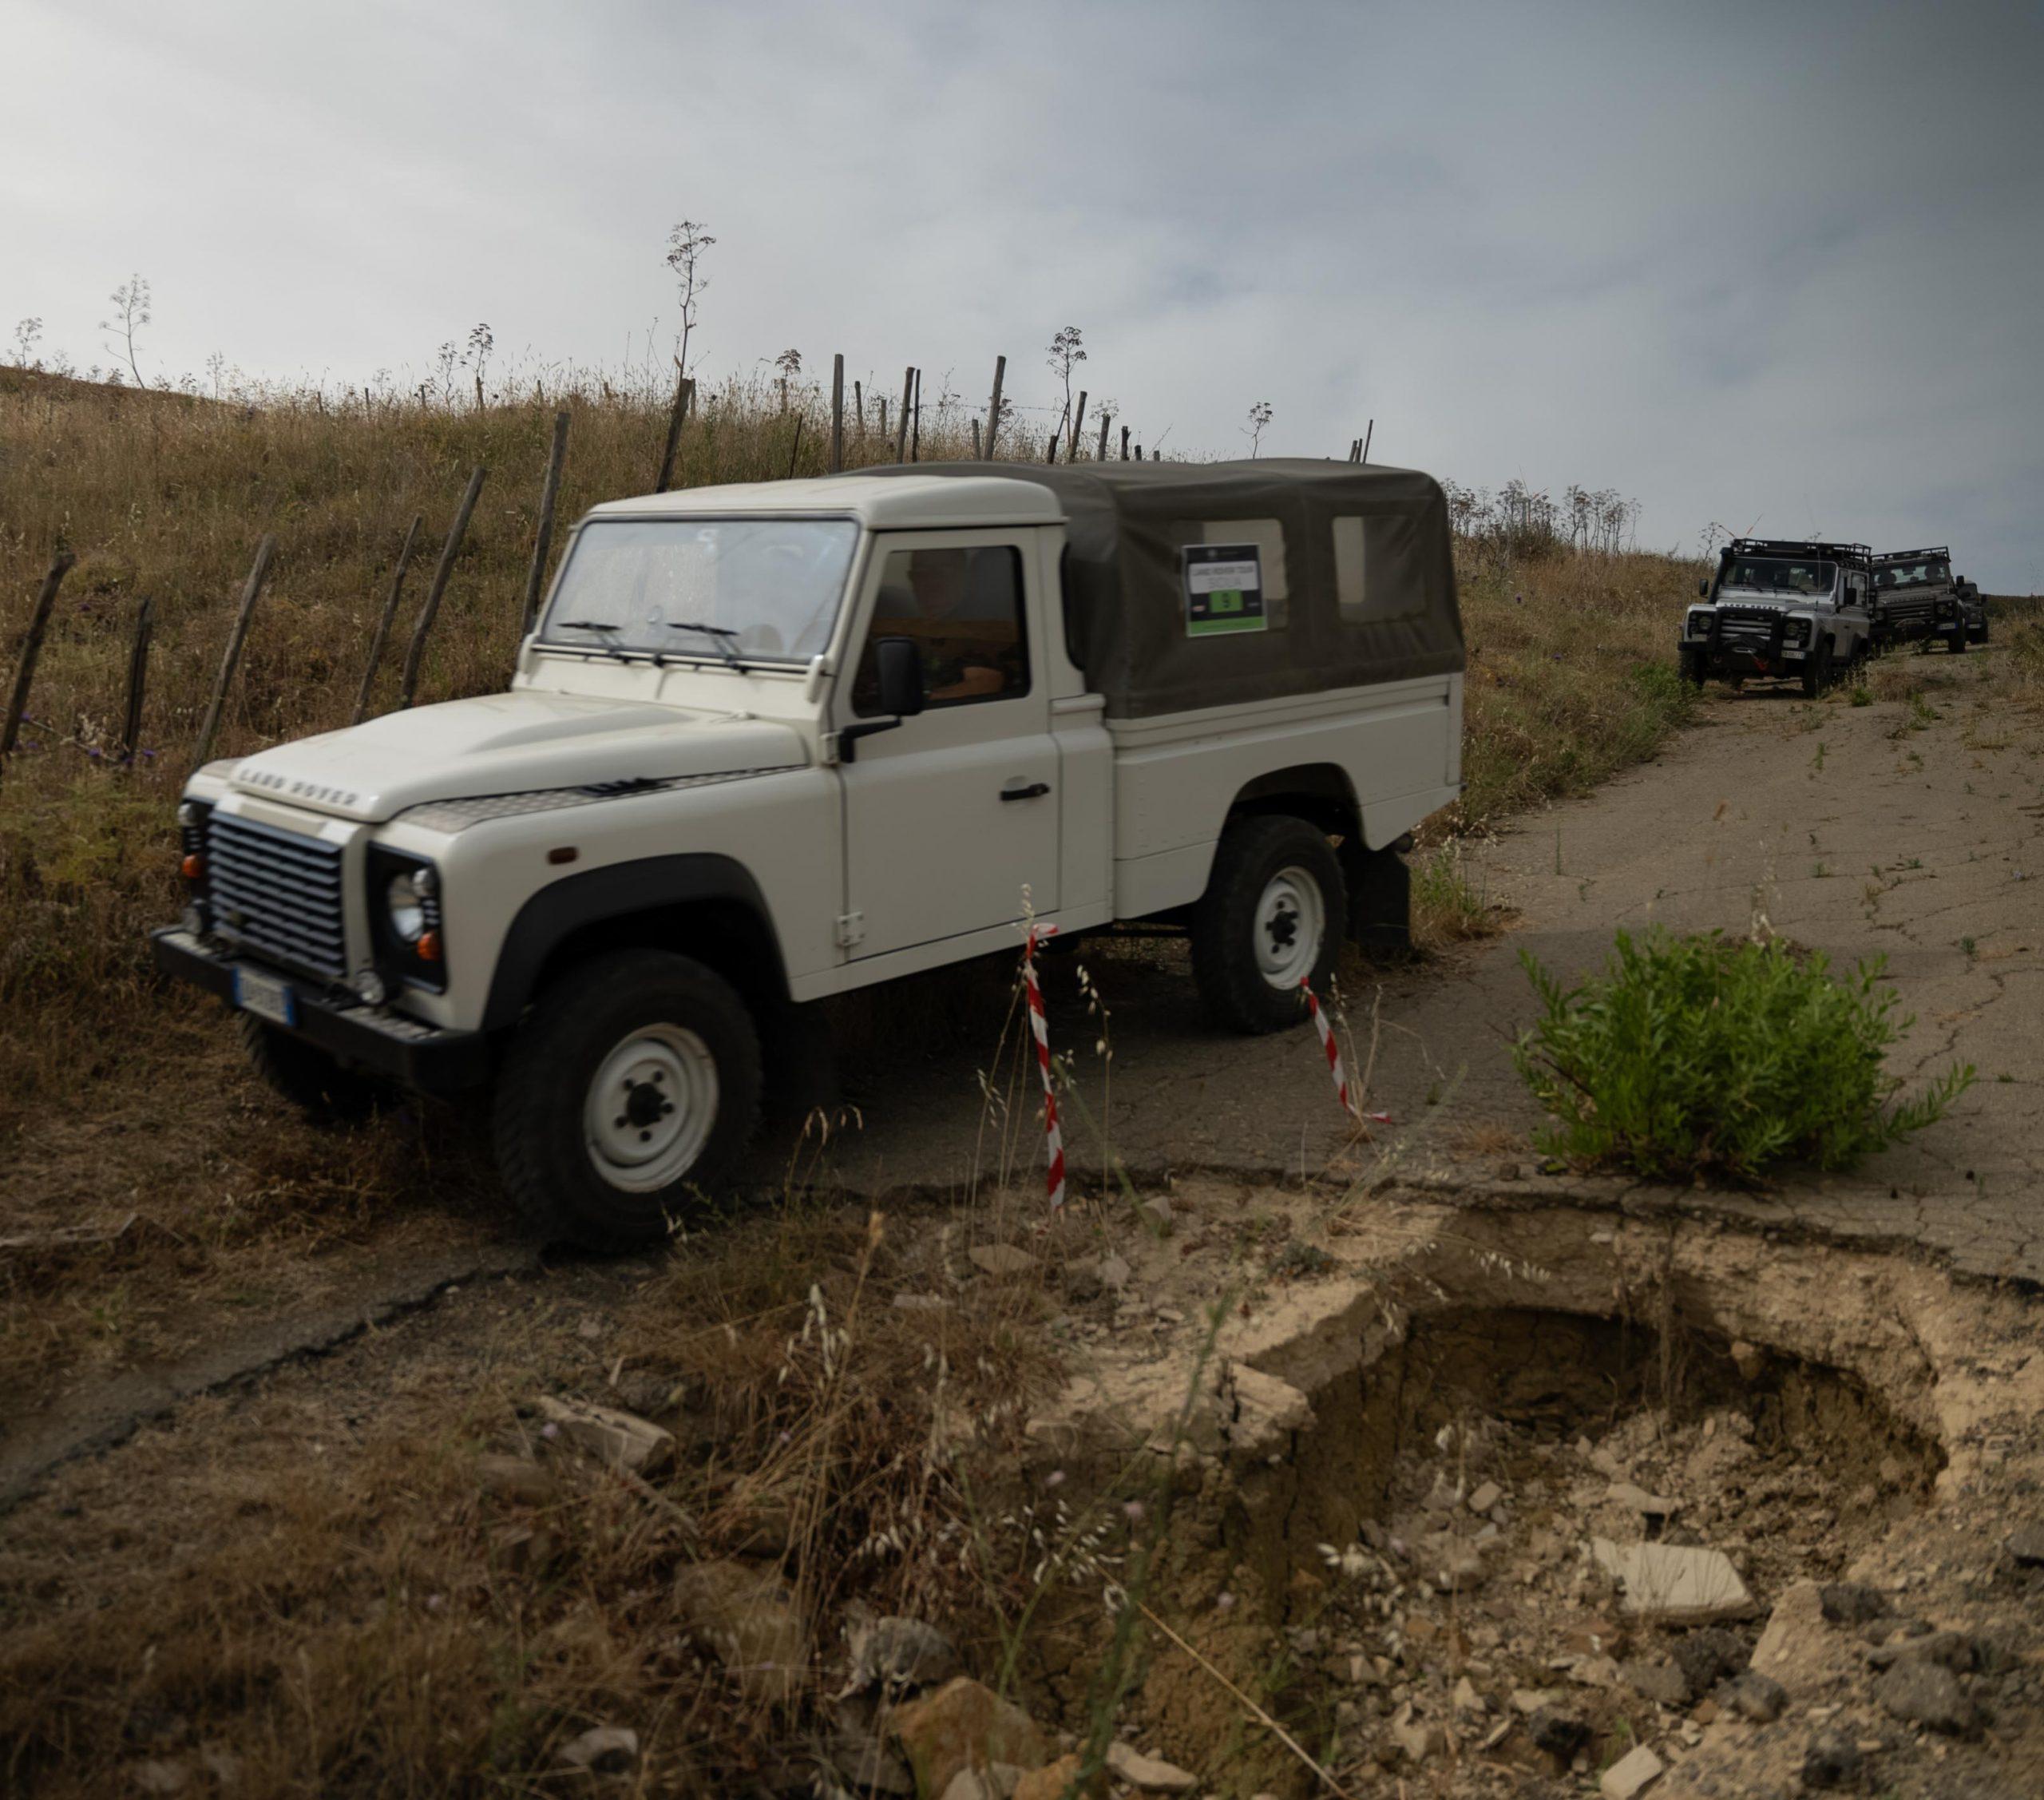 Land_Rover_Tour_Sicilia_2021_Land_Rover_Experience_Italia_-57